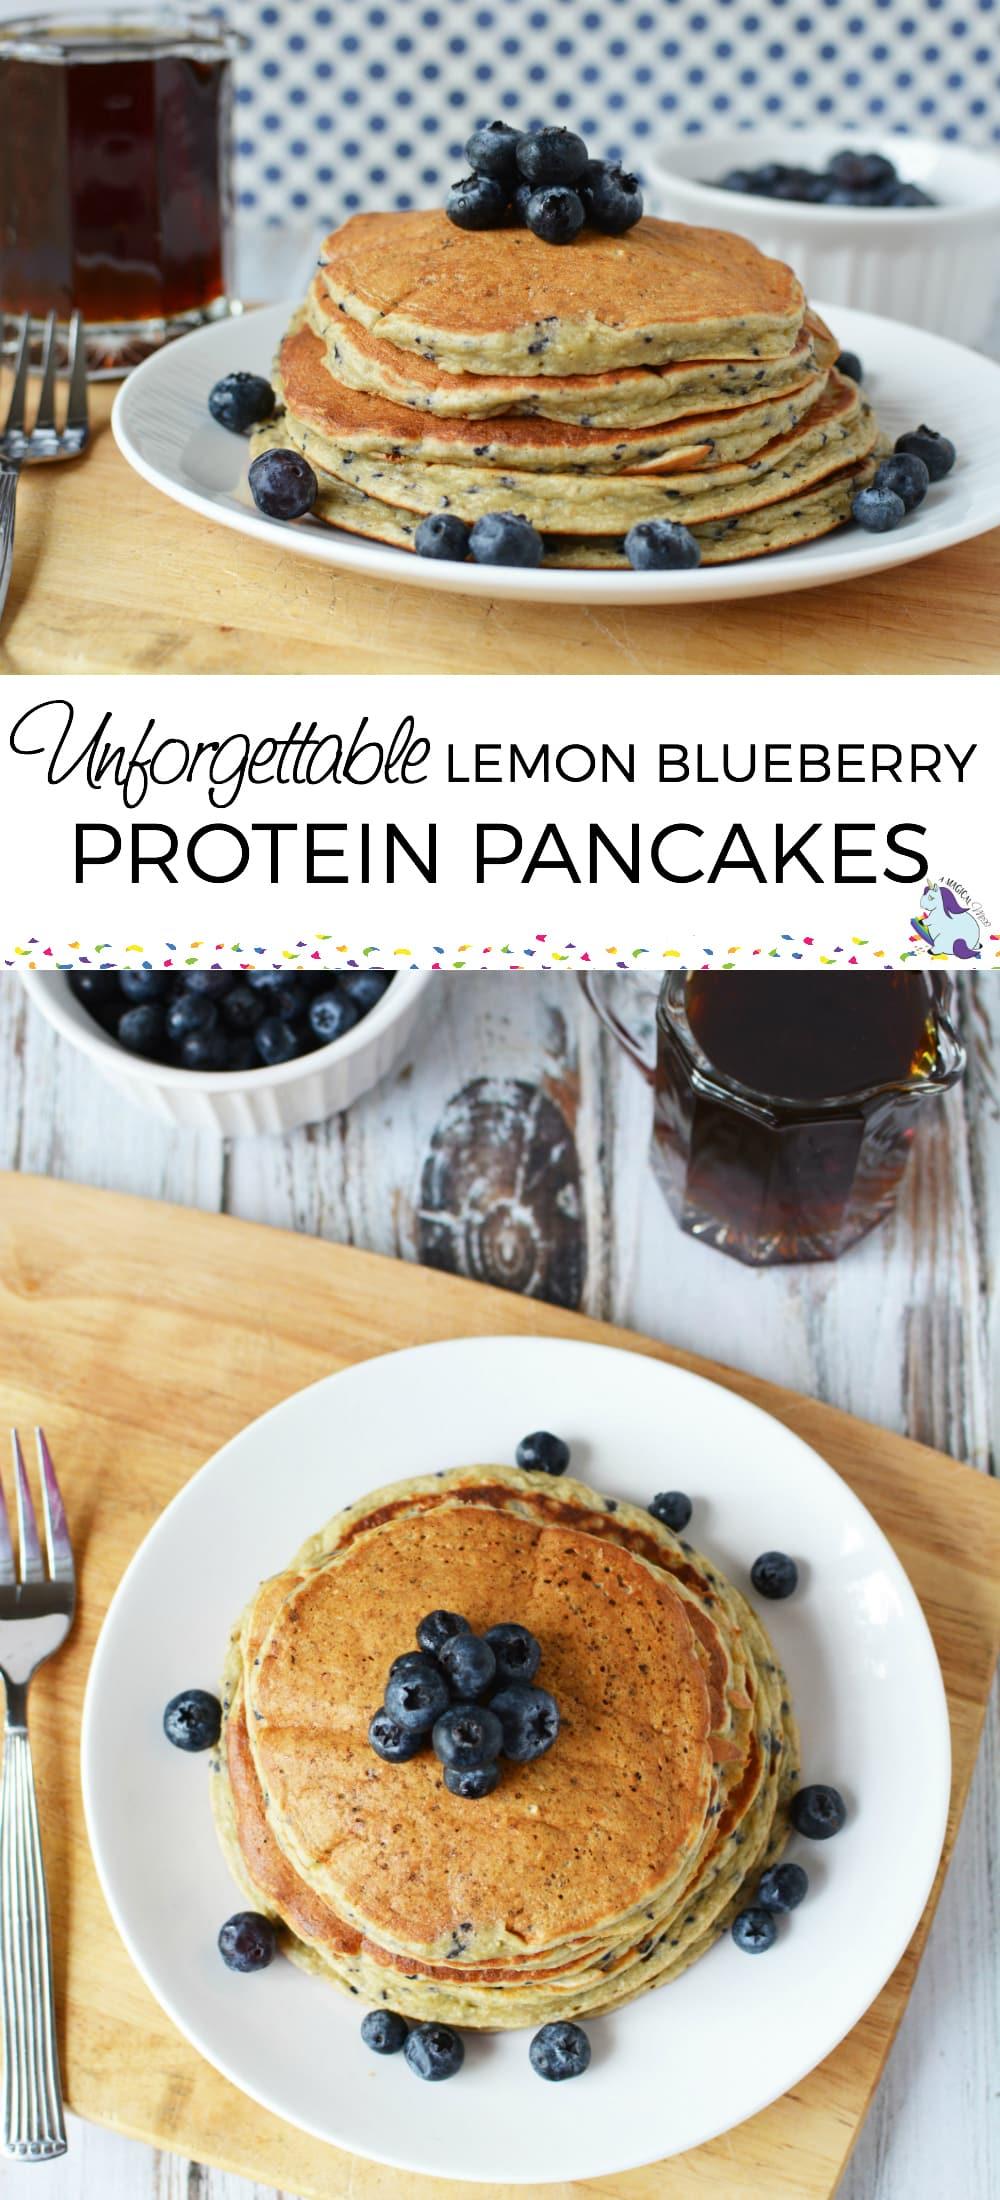 Best Protein Powder Pancakes - Unforgettable Lemon Blueberry #pancakes #recipe #breakfast #protein #proteinpancakes #lemon #blueberry